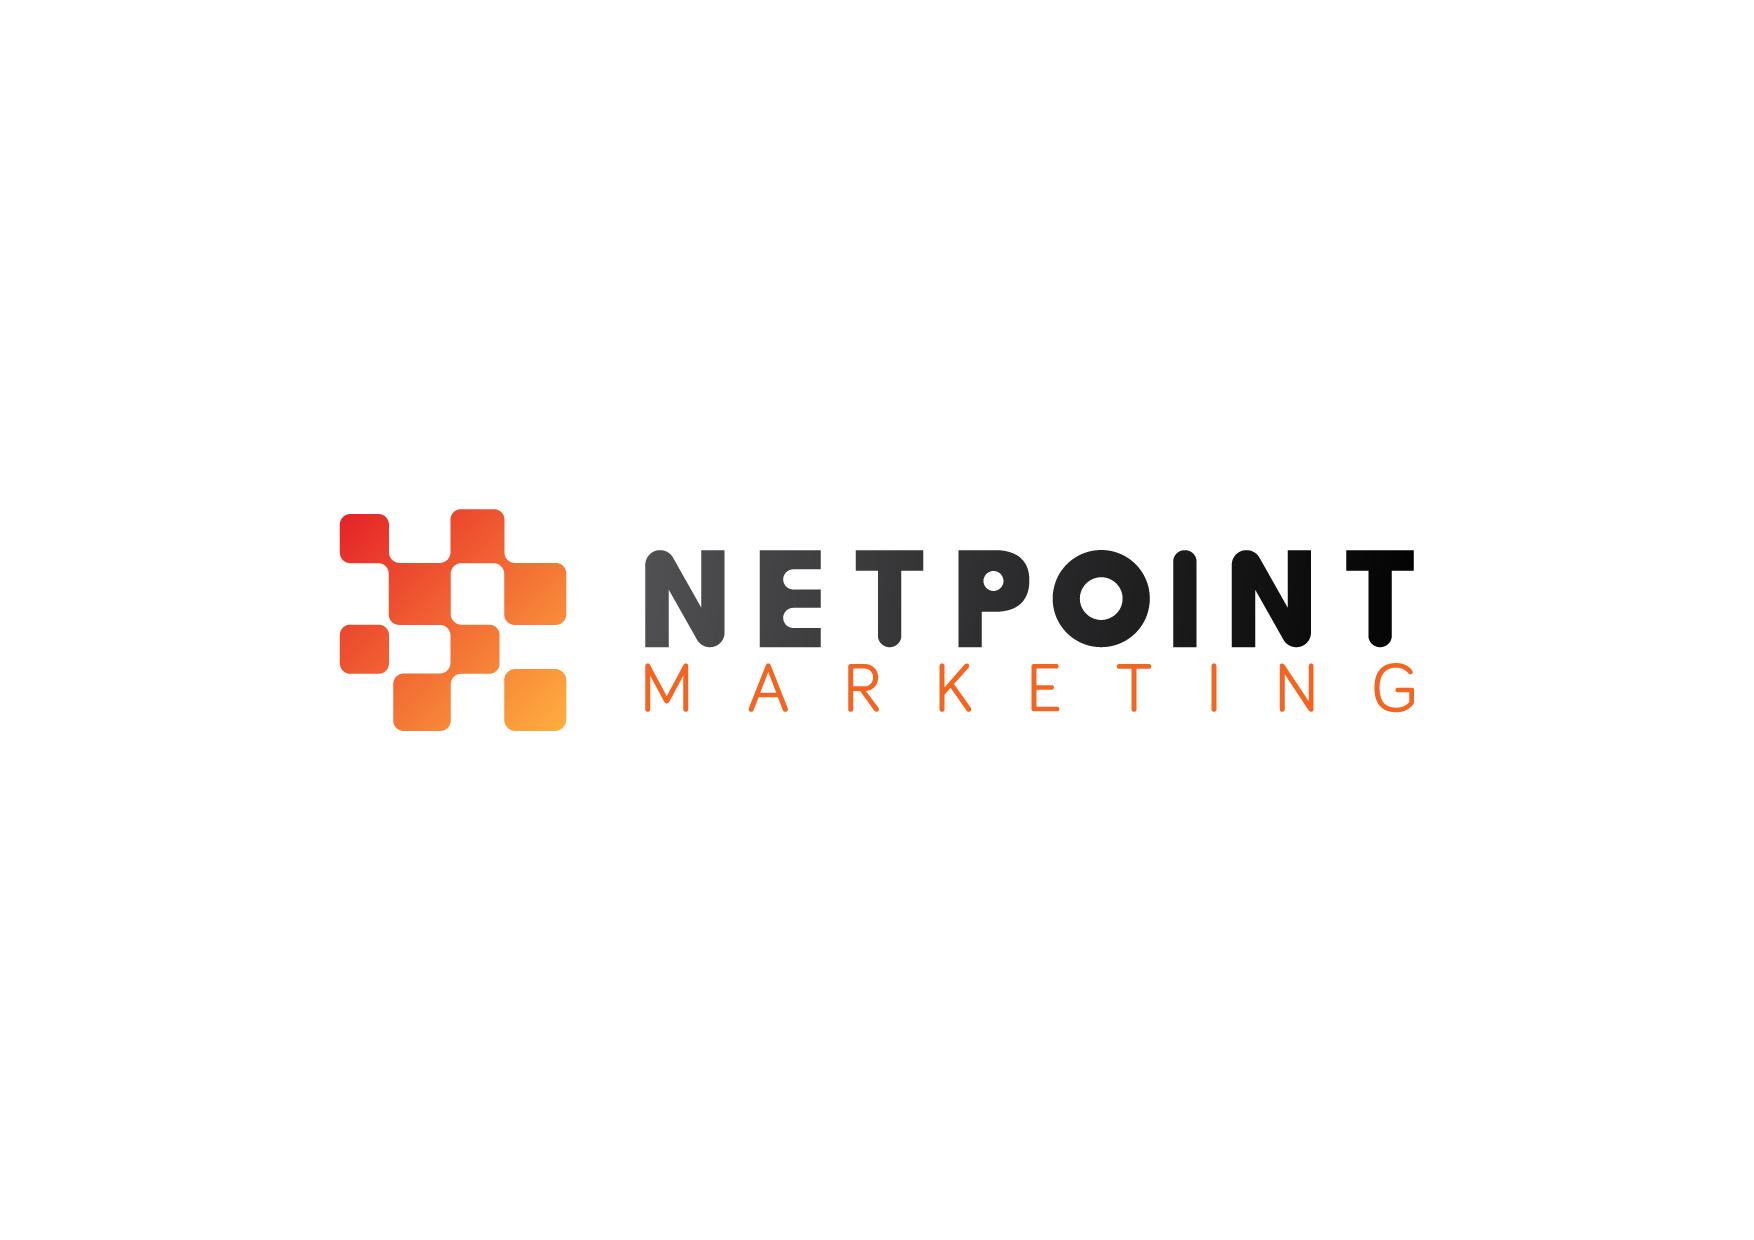 Net Point Marketing